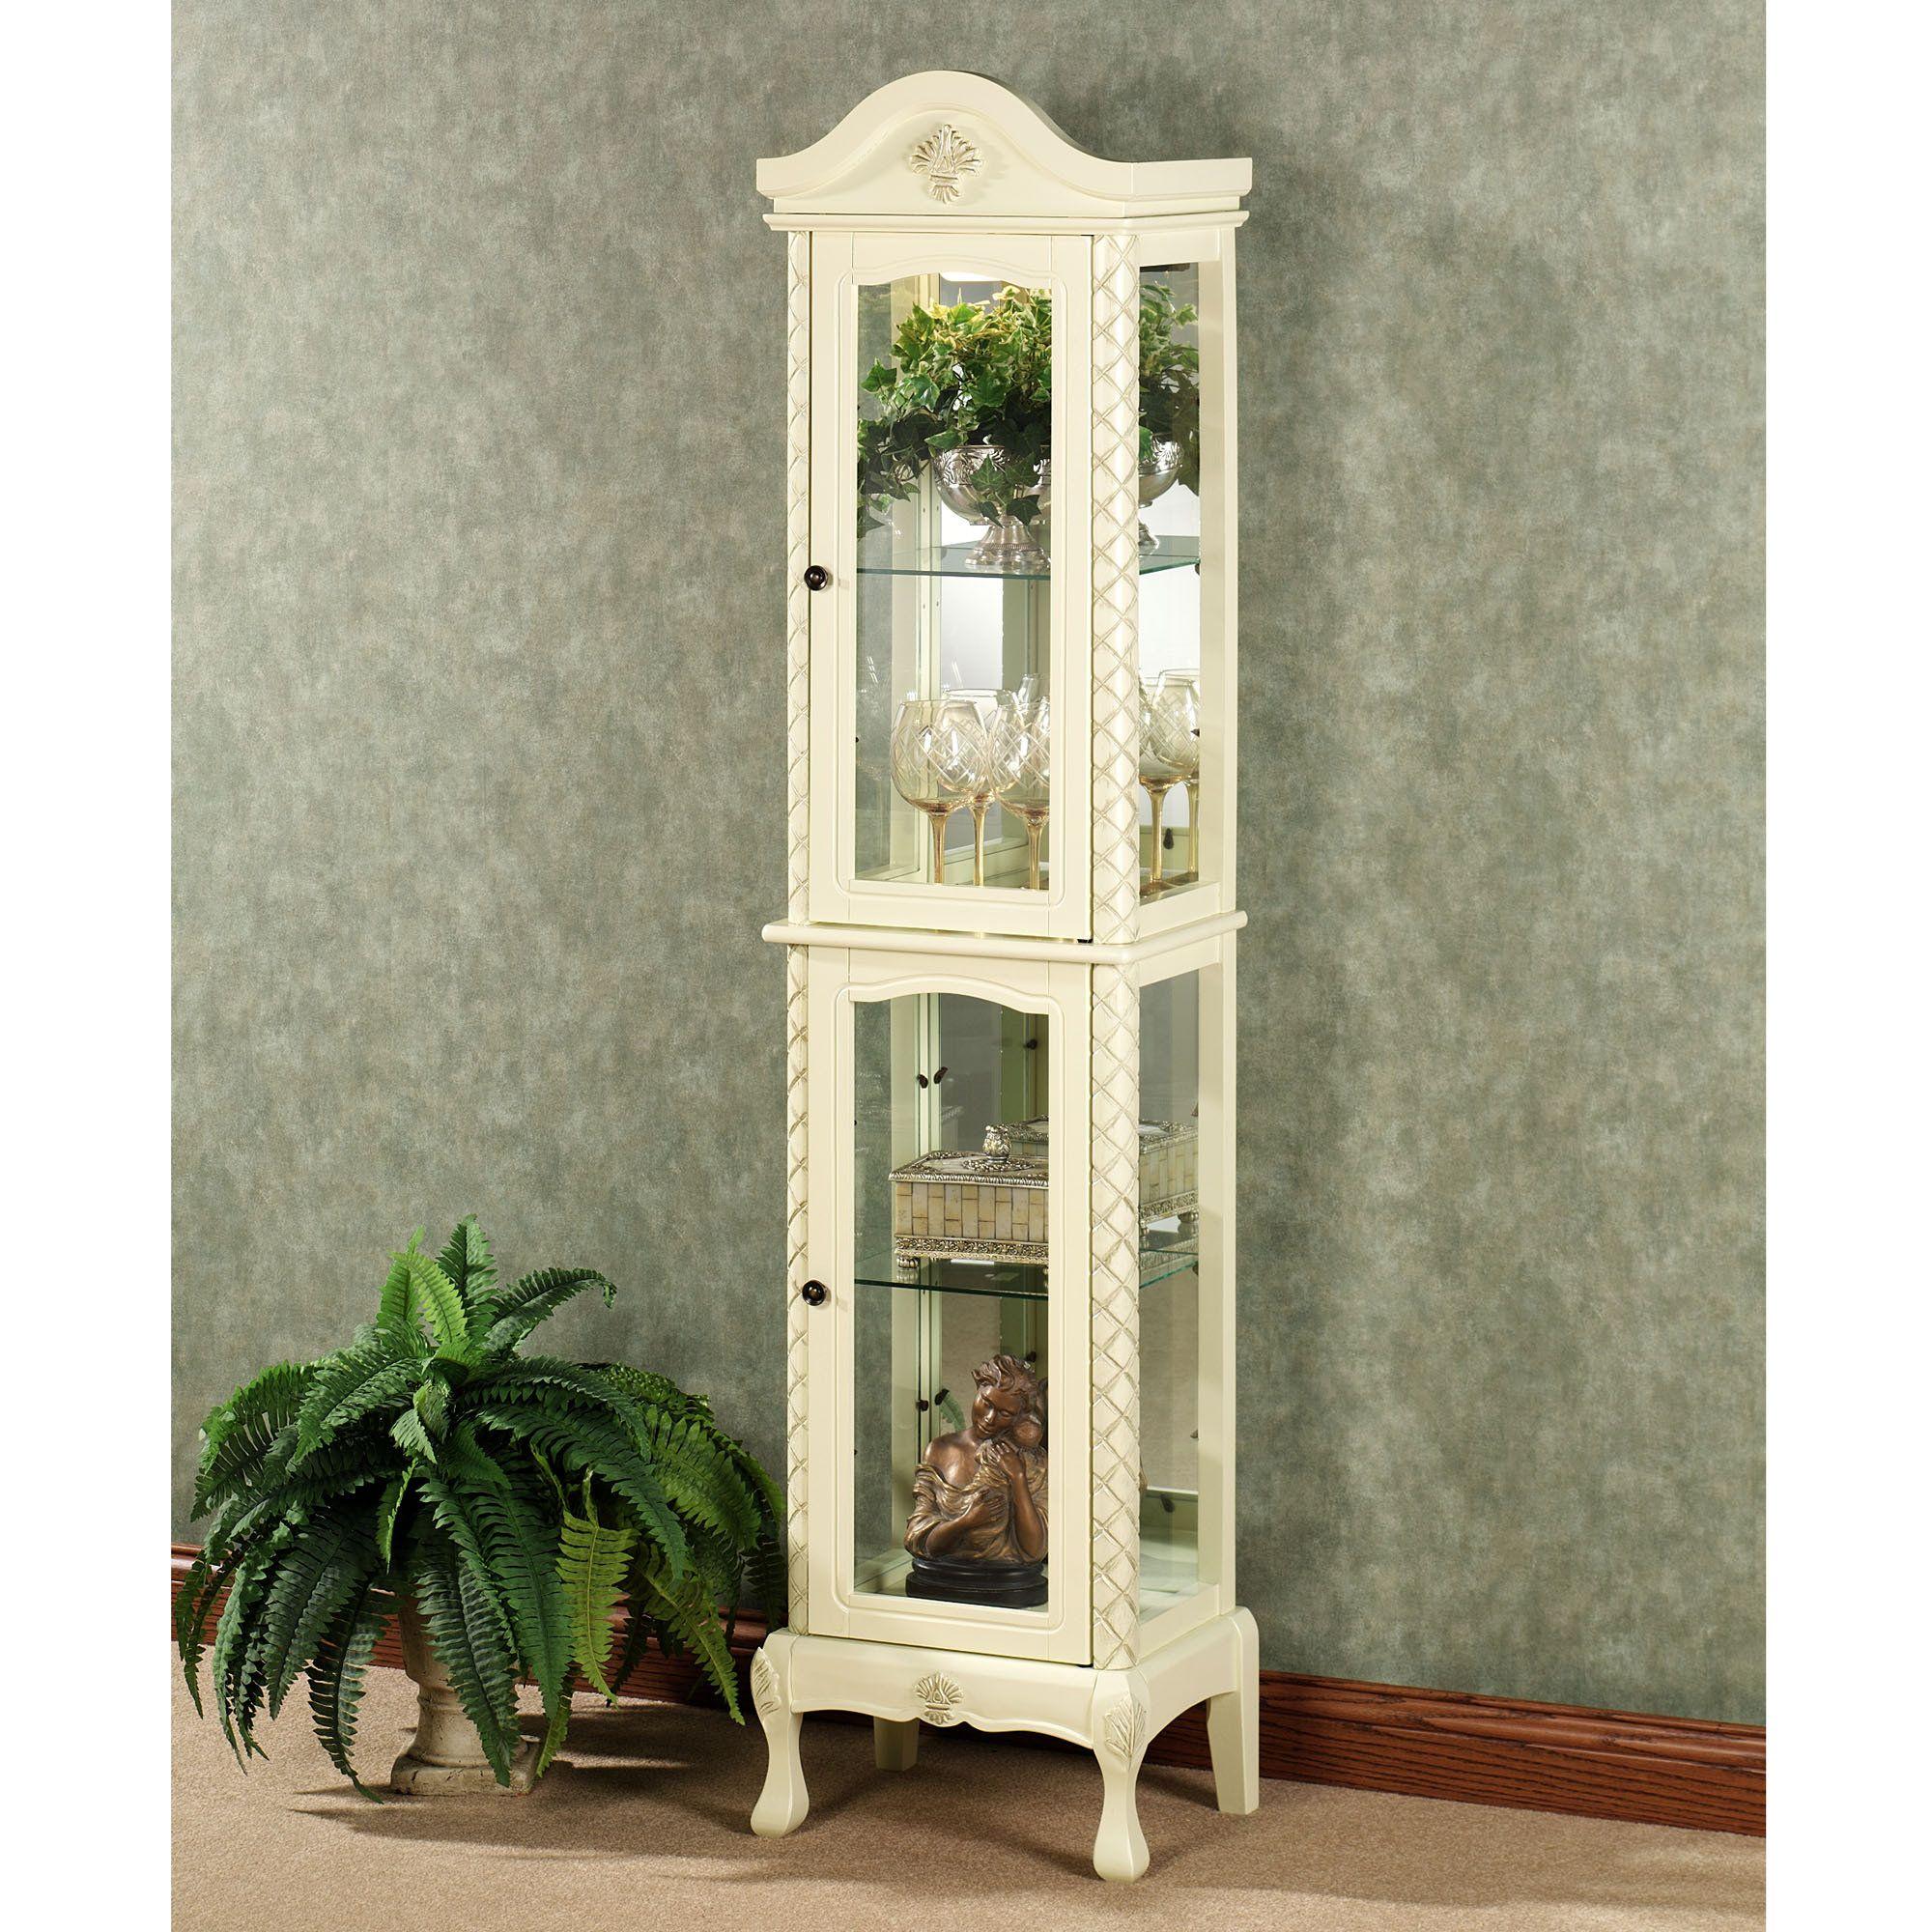 Winchell Curio Cabinet Ivory  Design Ideas  Wall curio